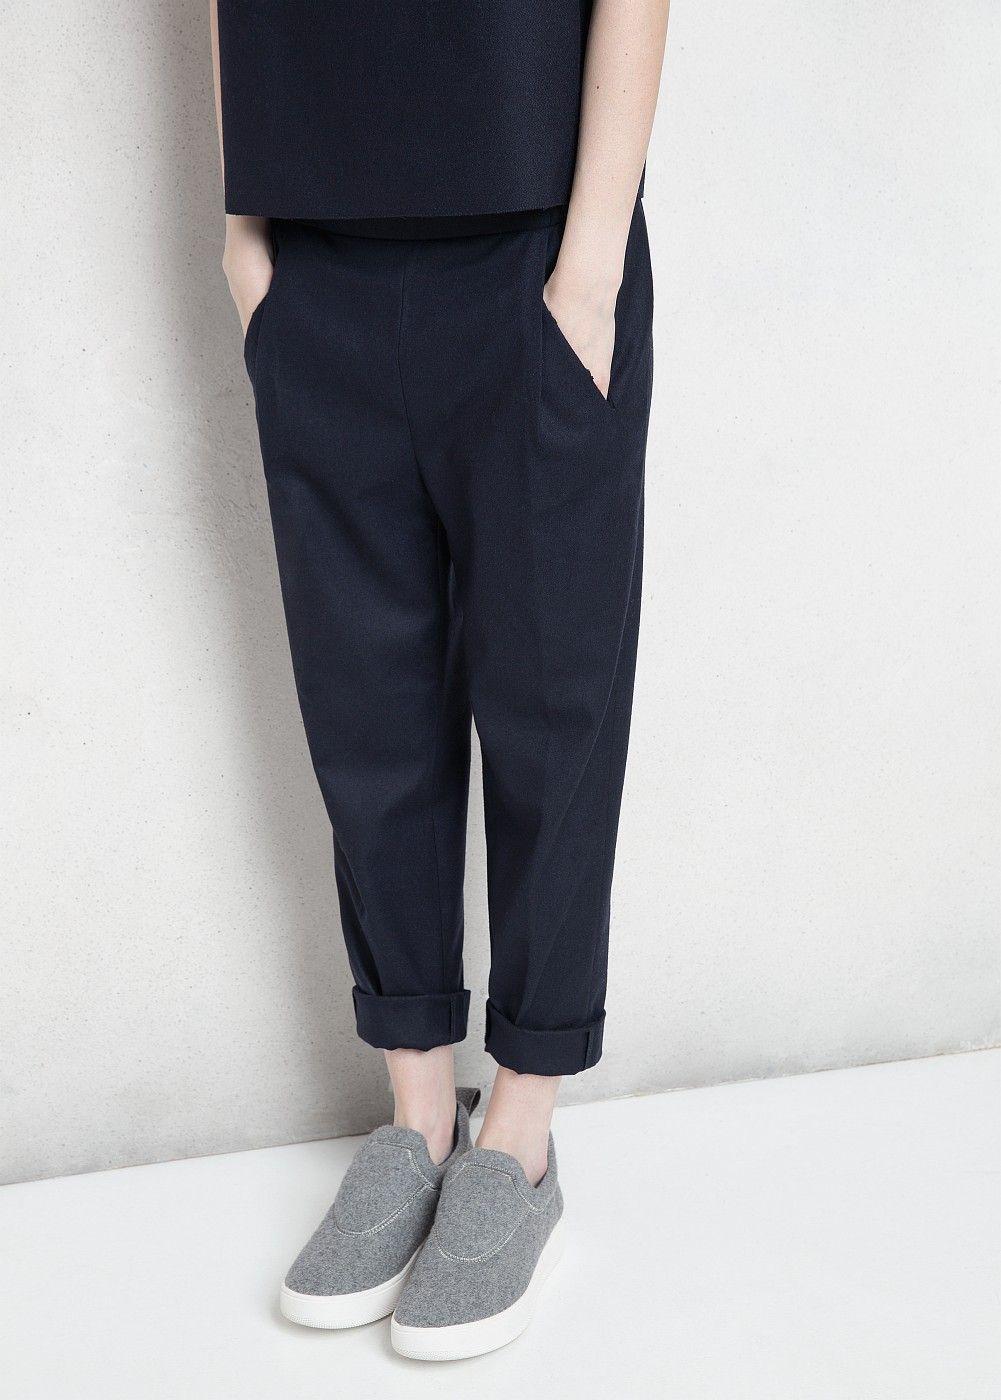 Premium - pantalón baggy lana - Mujer  cce5c3e32385